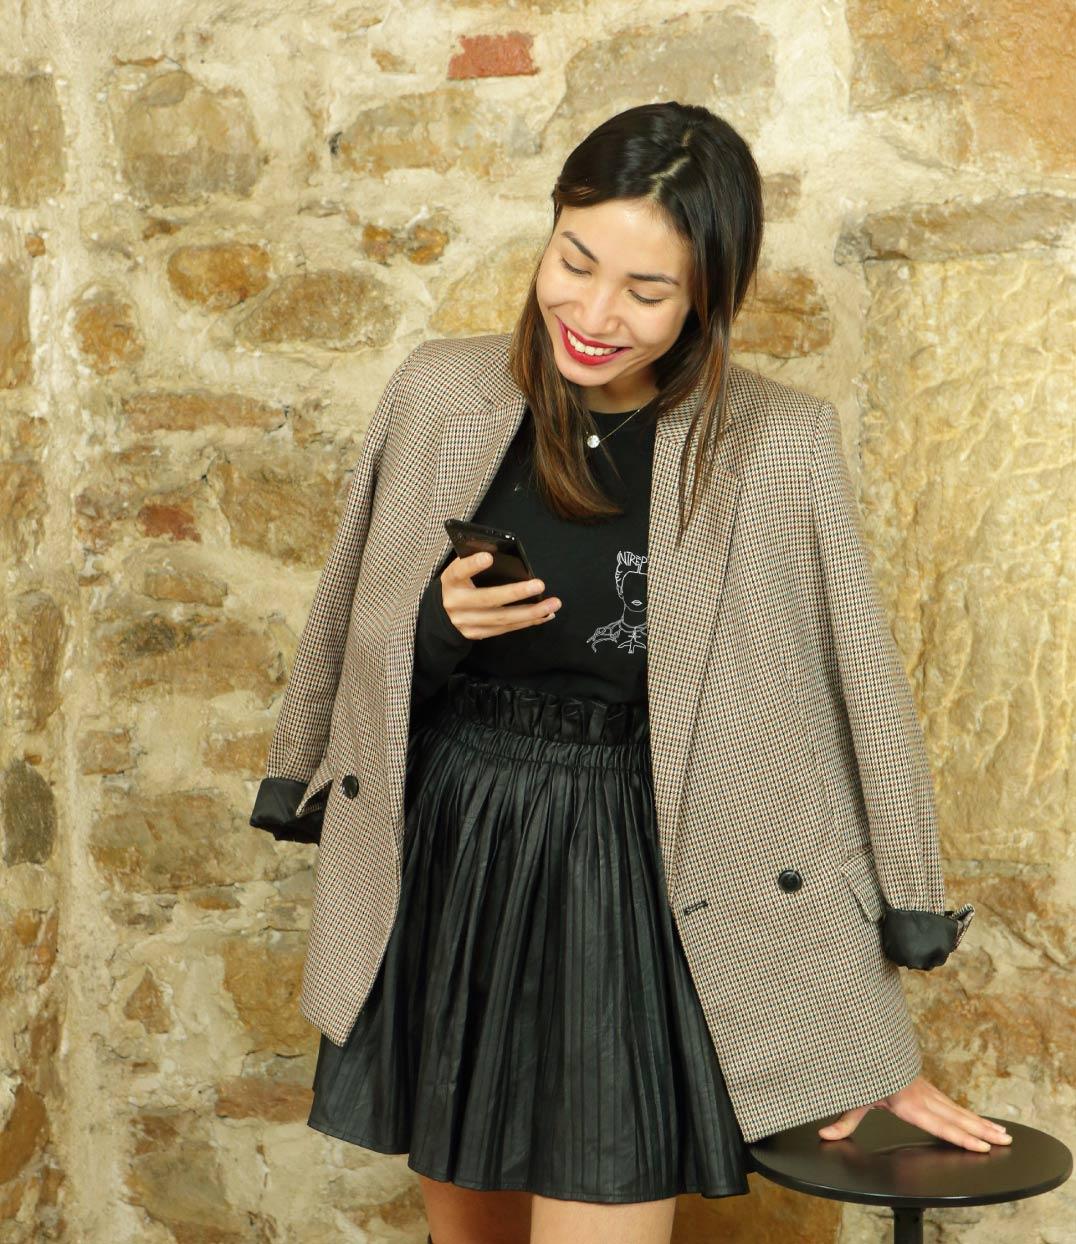 femme souriante regardant son telephone portant un tshirt noir leonor roversi